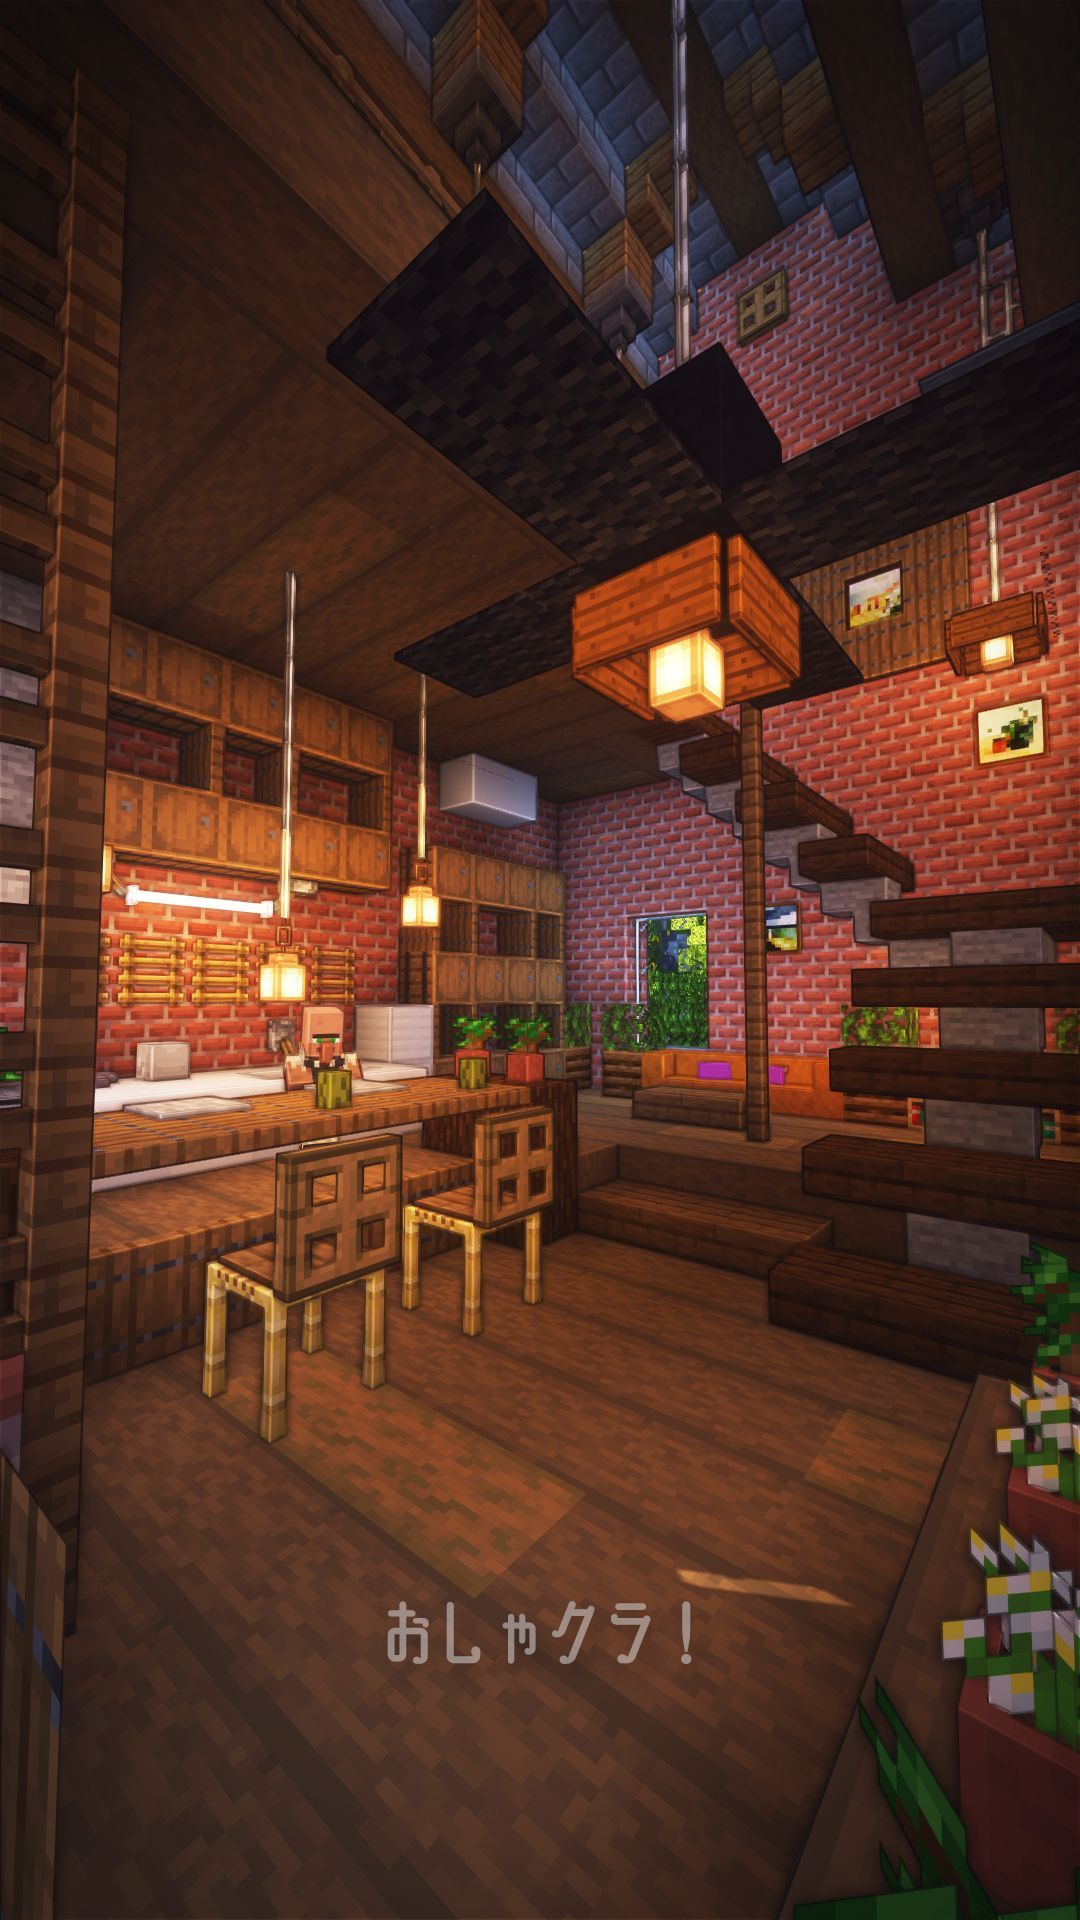 Part91 Interior design reference design interior part91 reference